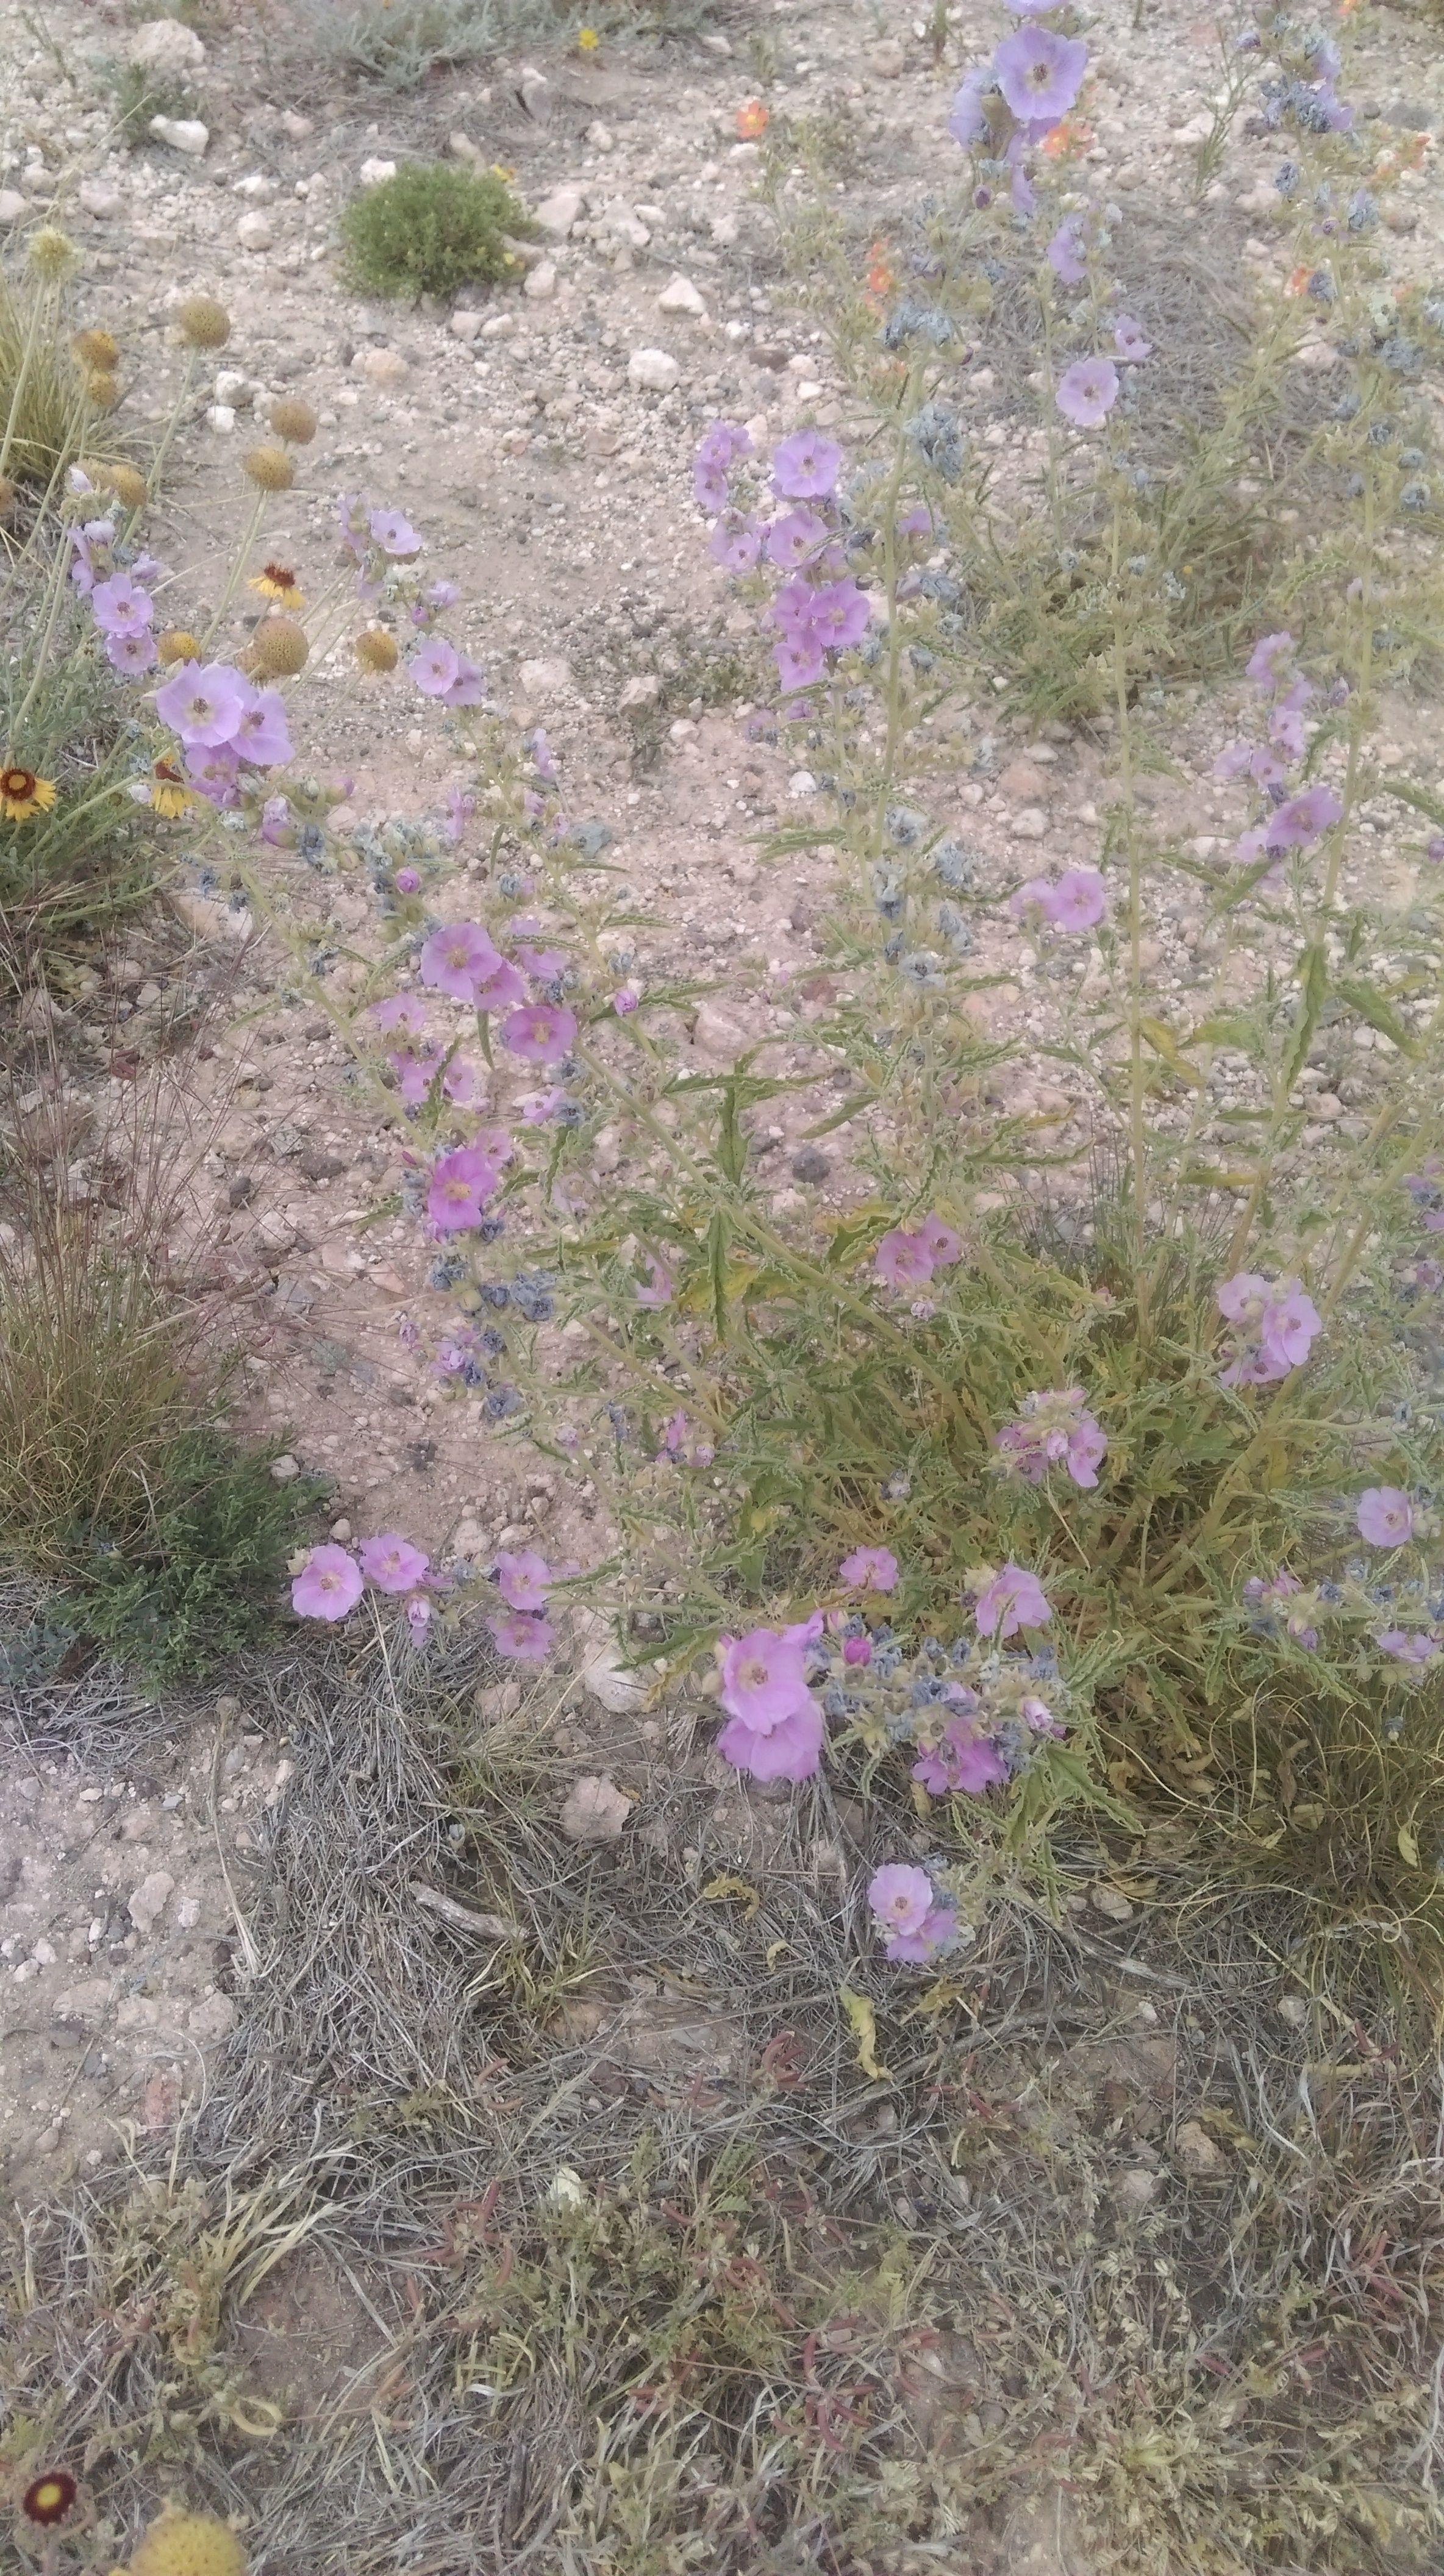 Pink globe mallow Sphaeralcea angustifolia in Fort Davis TX